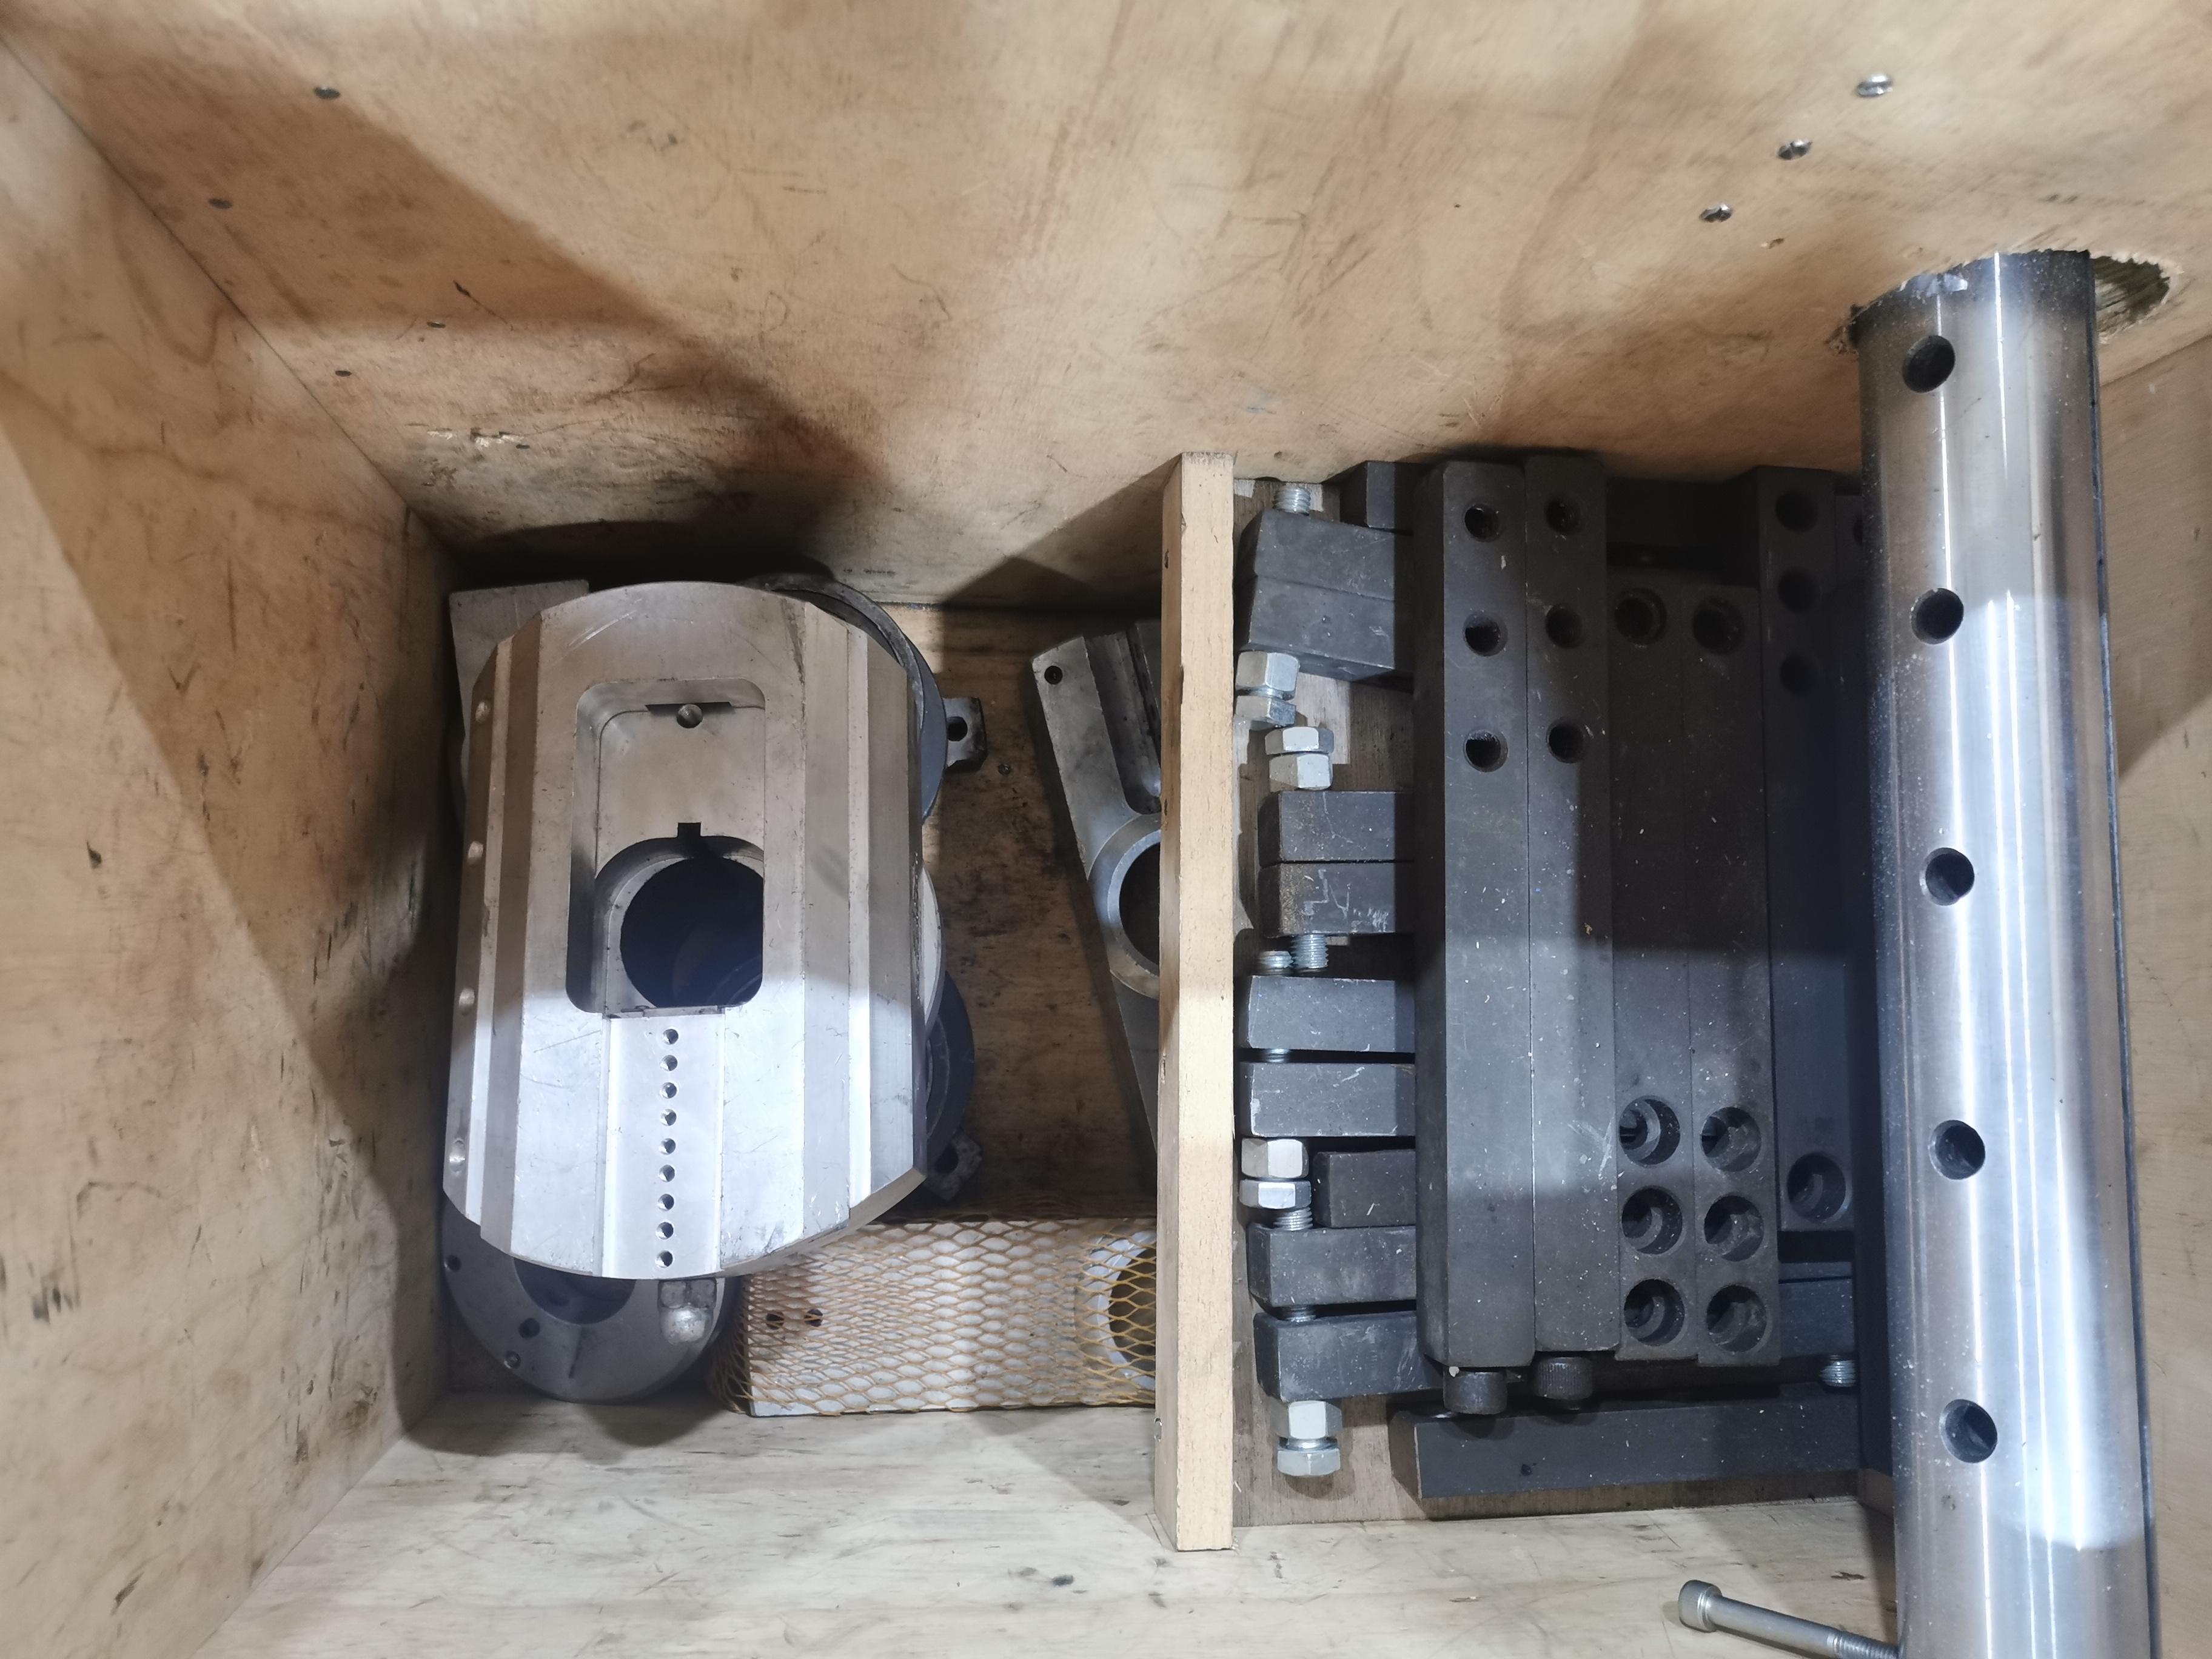 Barenatrice portatile sir meccanica ws3 in vendita - foto 3